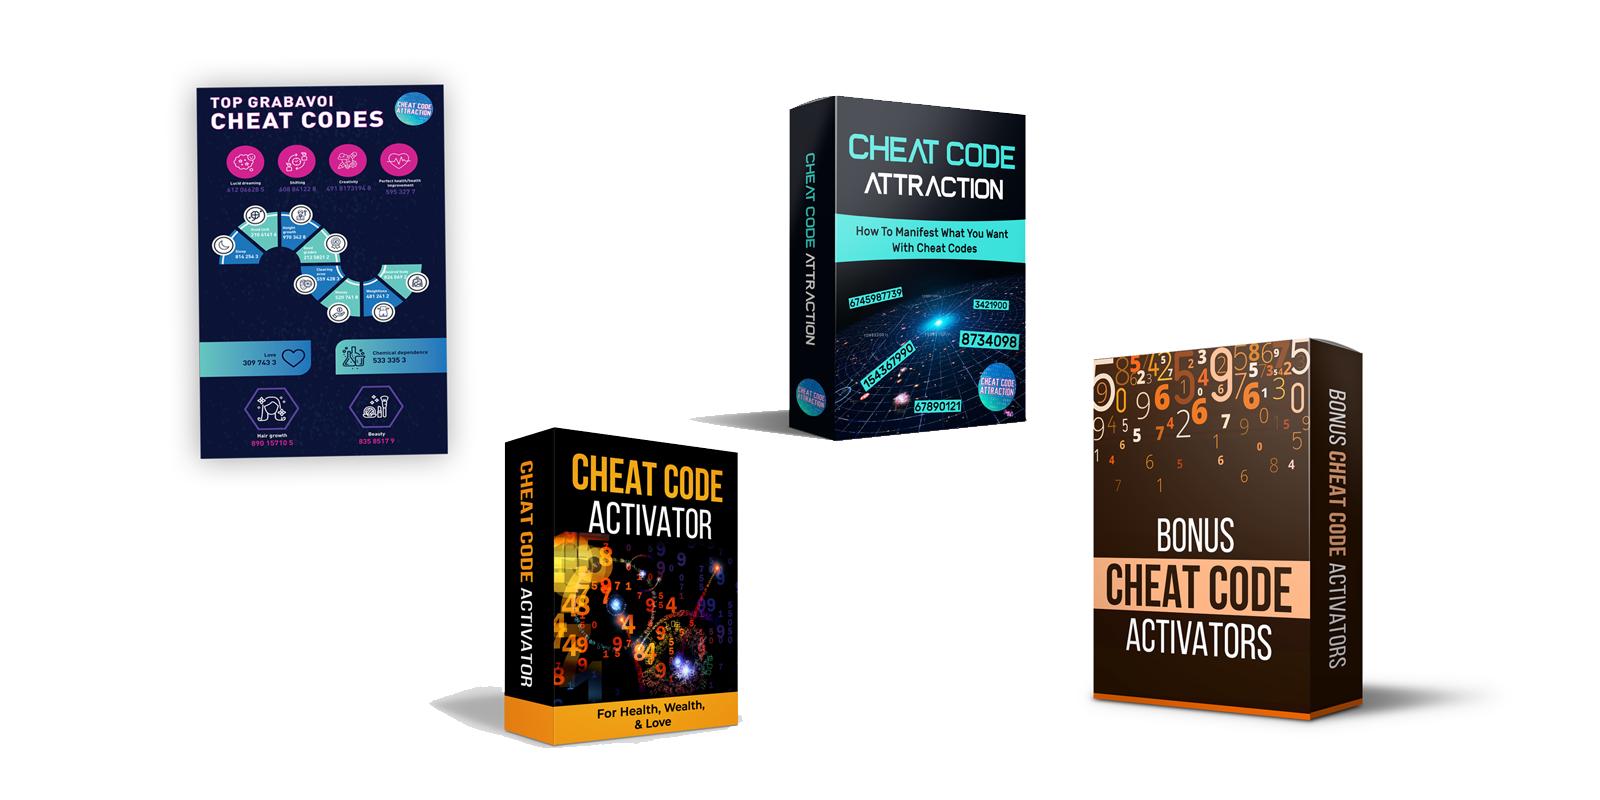 Cheat Code Attraction bonuses